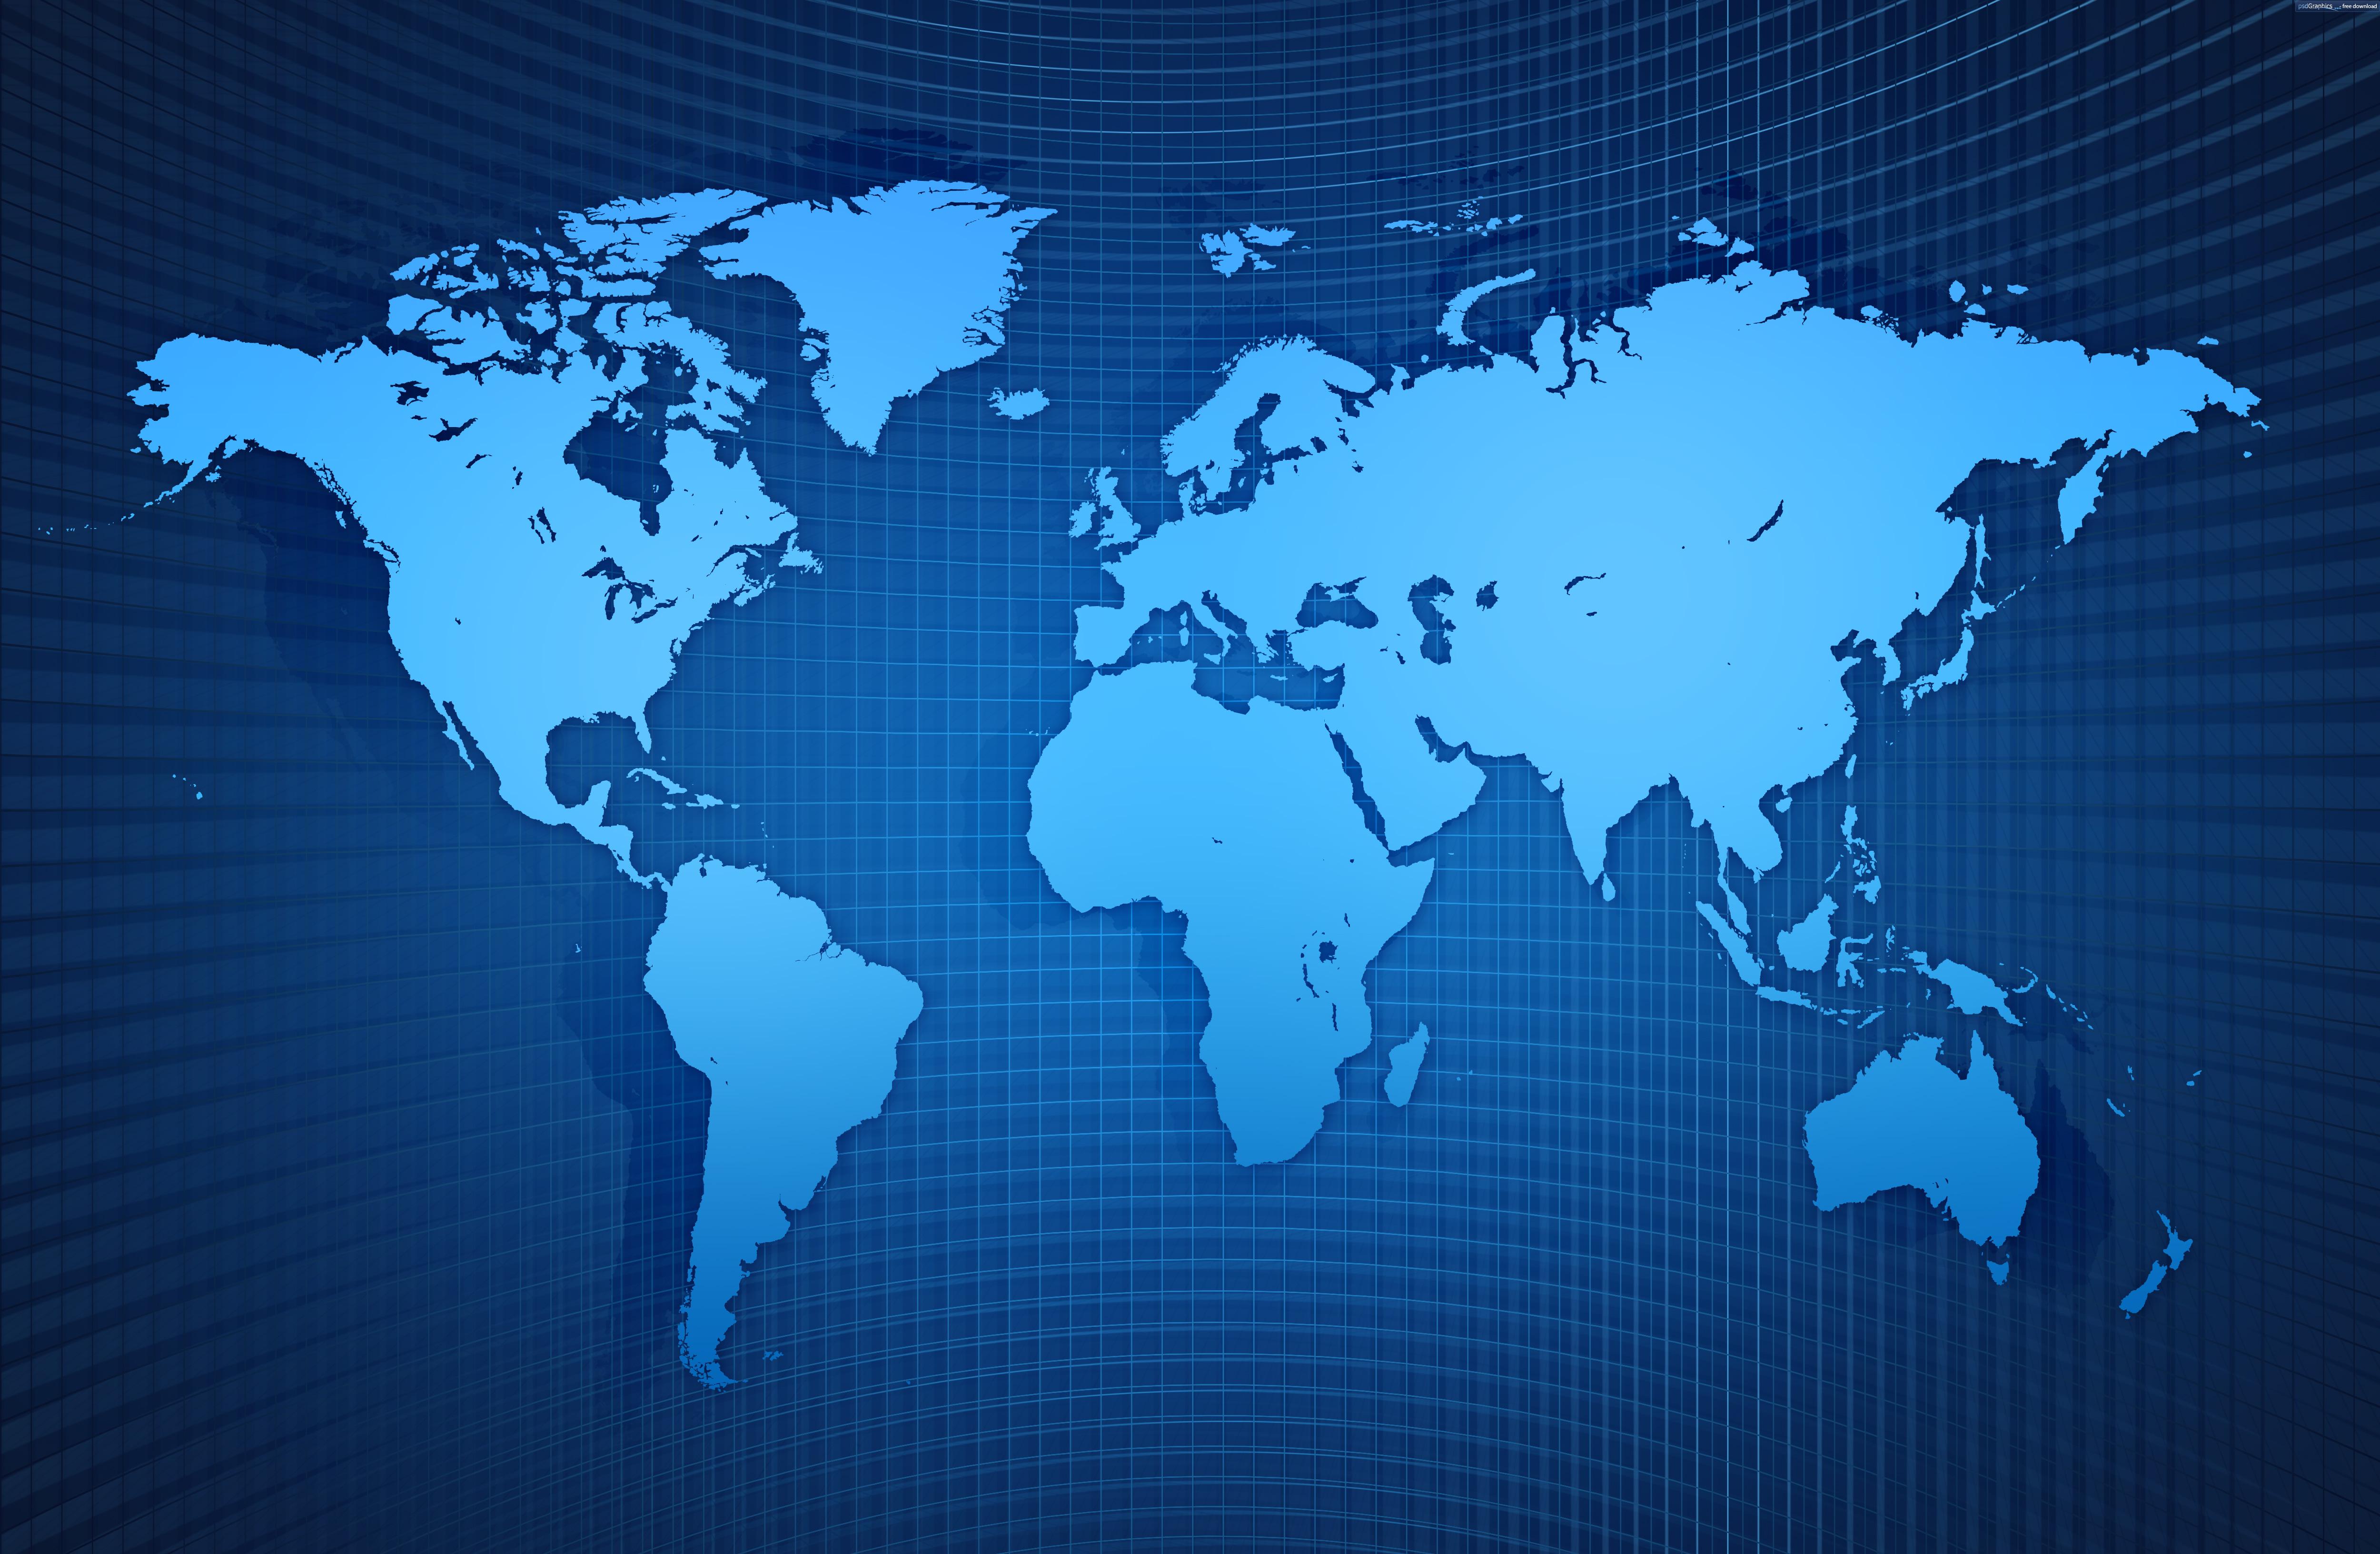 World map background PSDGraphics 5000x3264